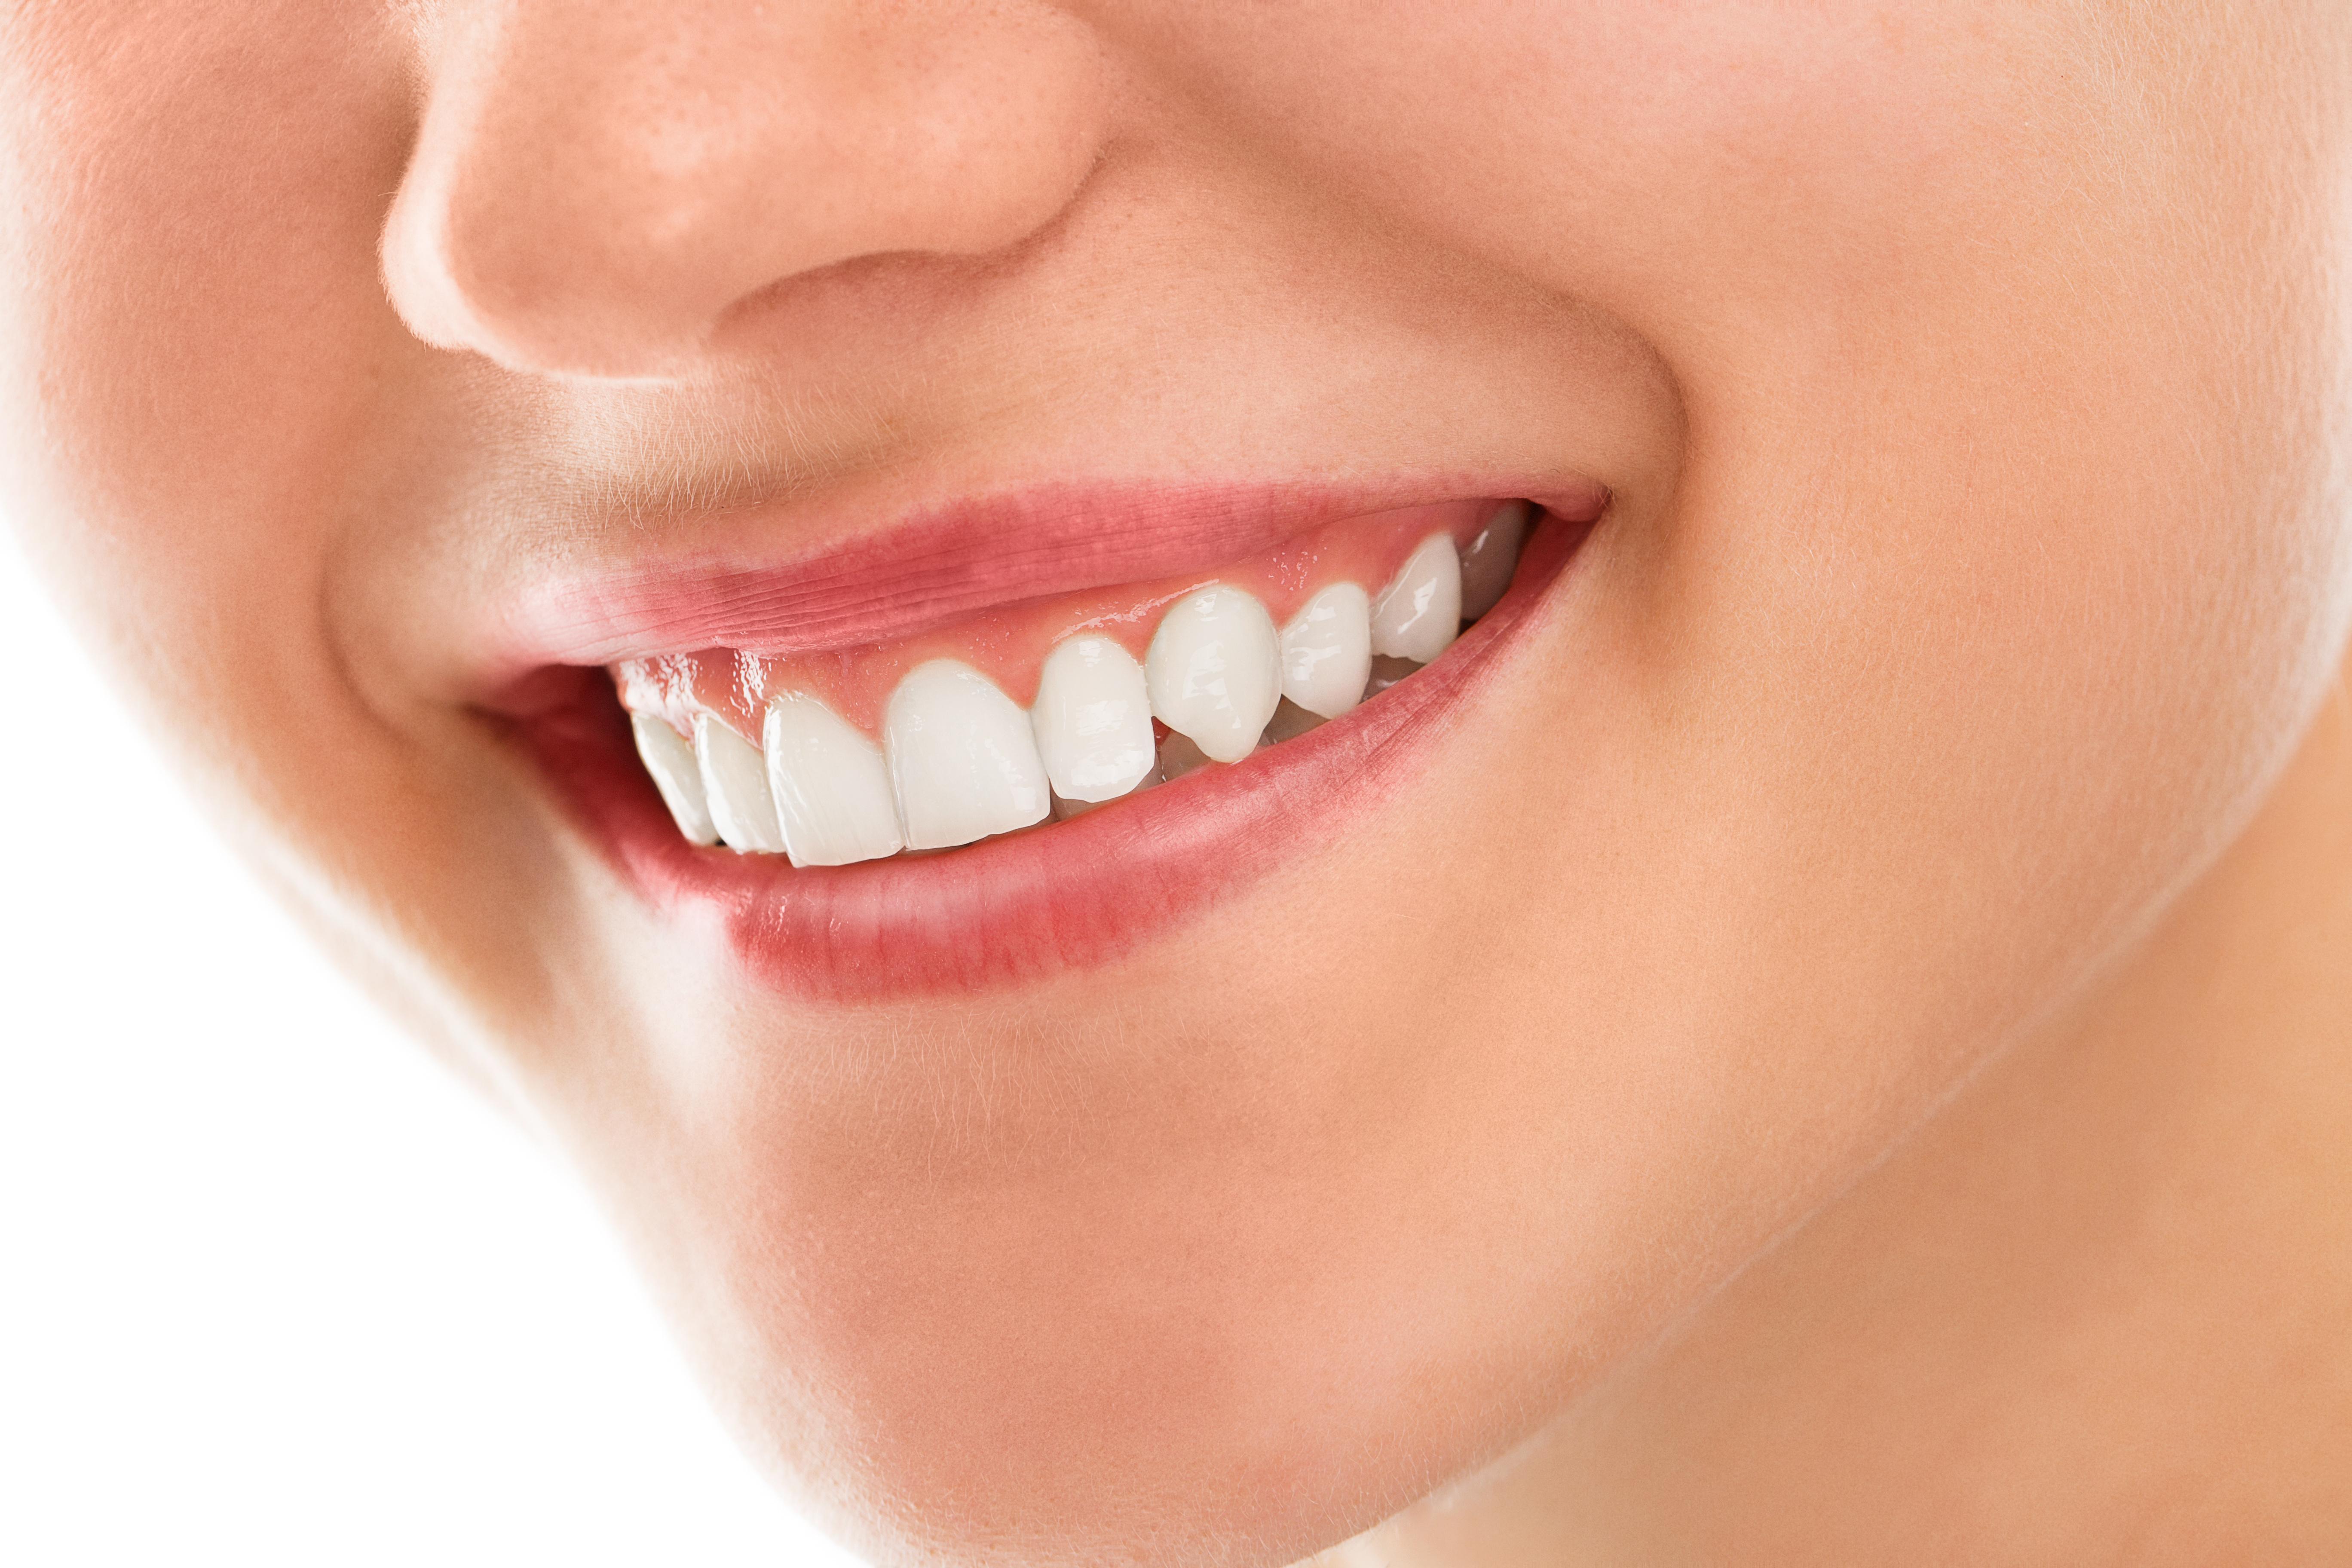 Periodontics - Best Dentist in Hanover